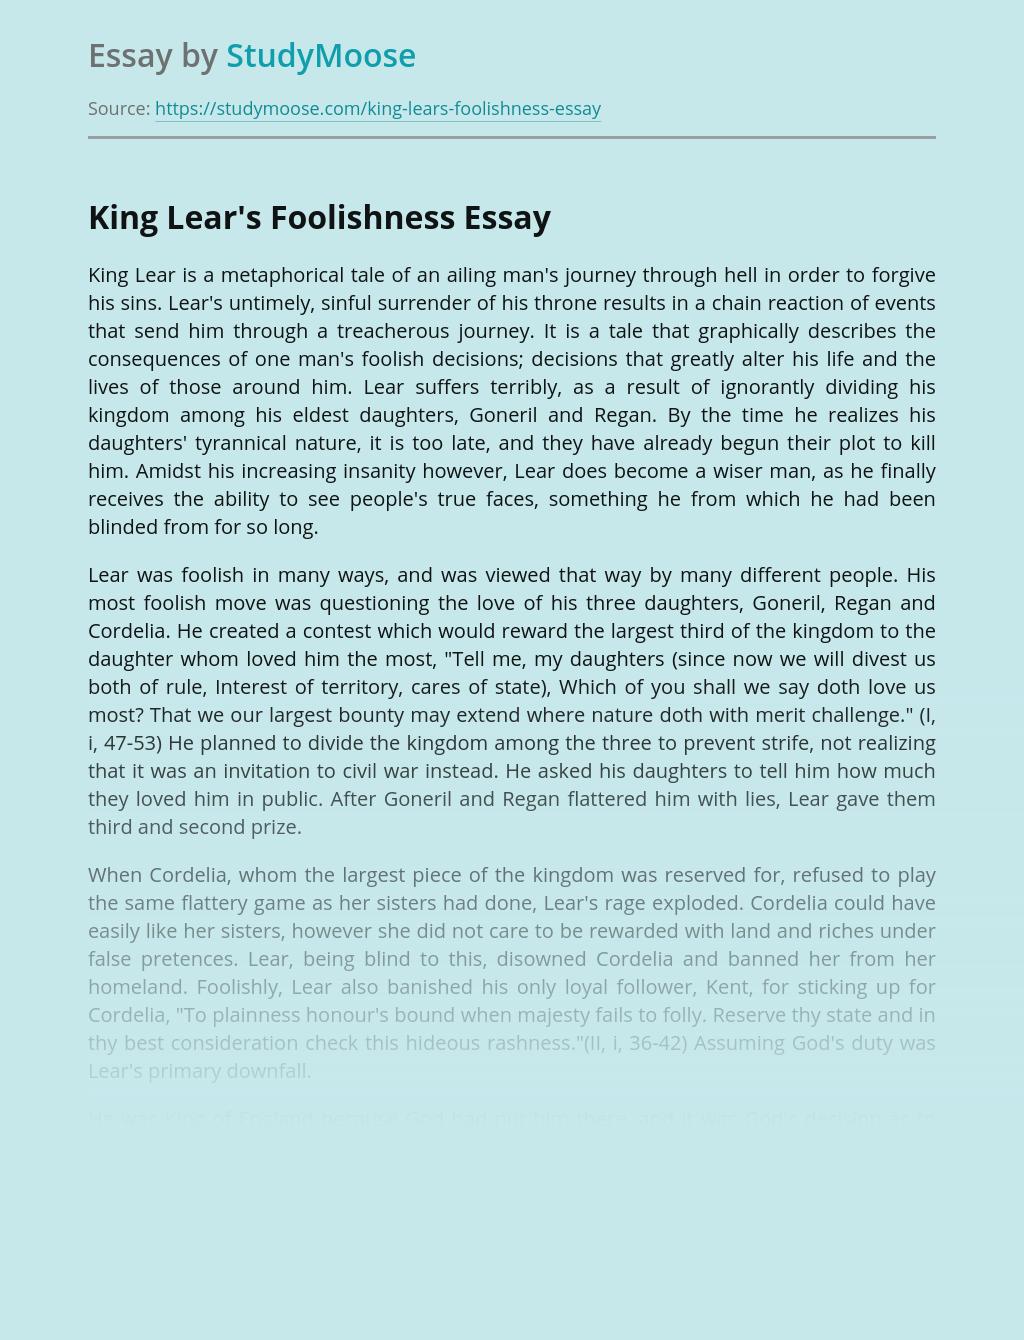 King Lear's Foolishness